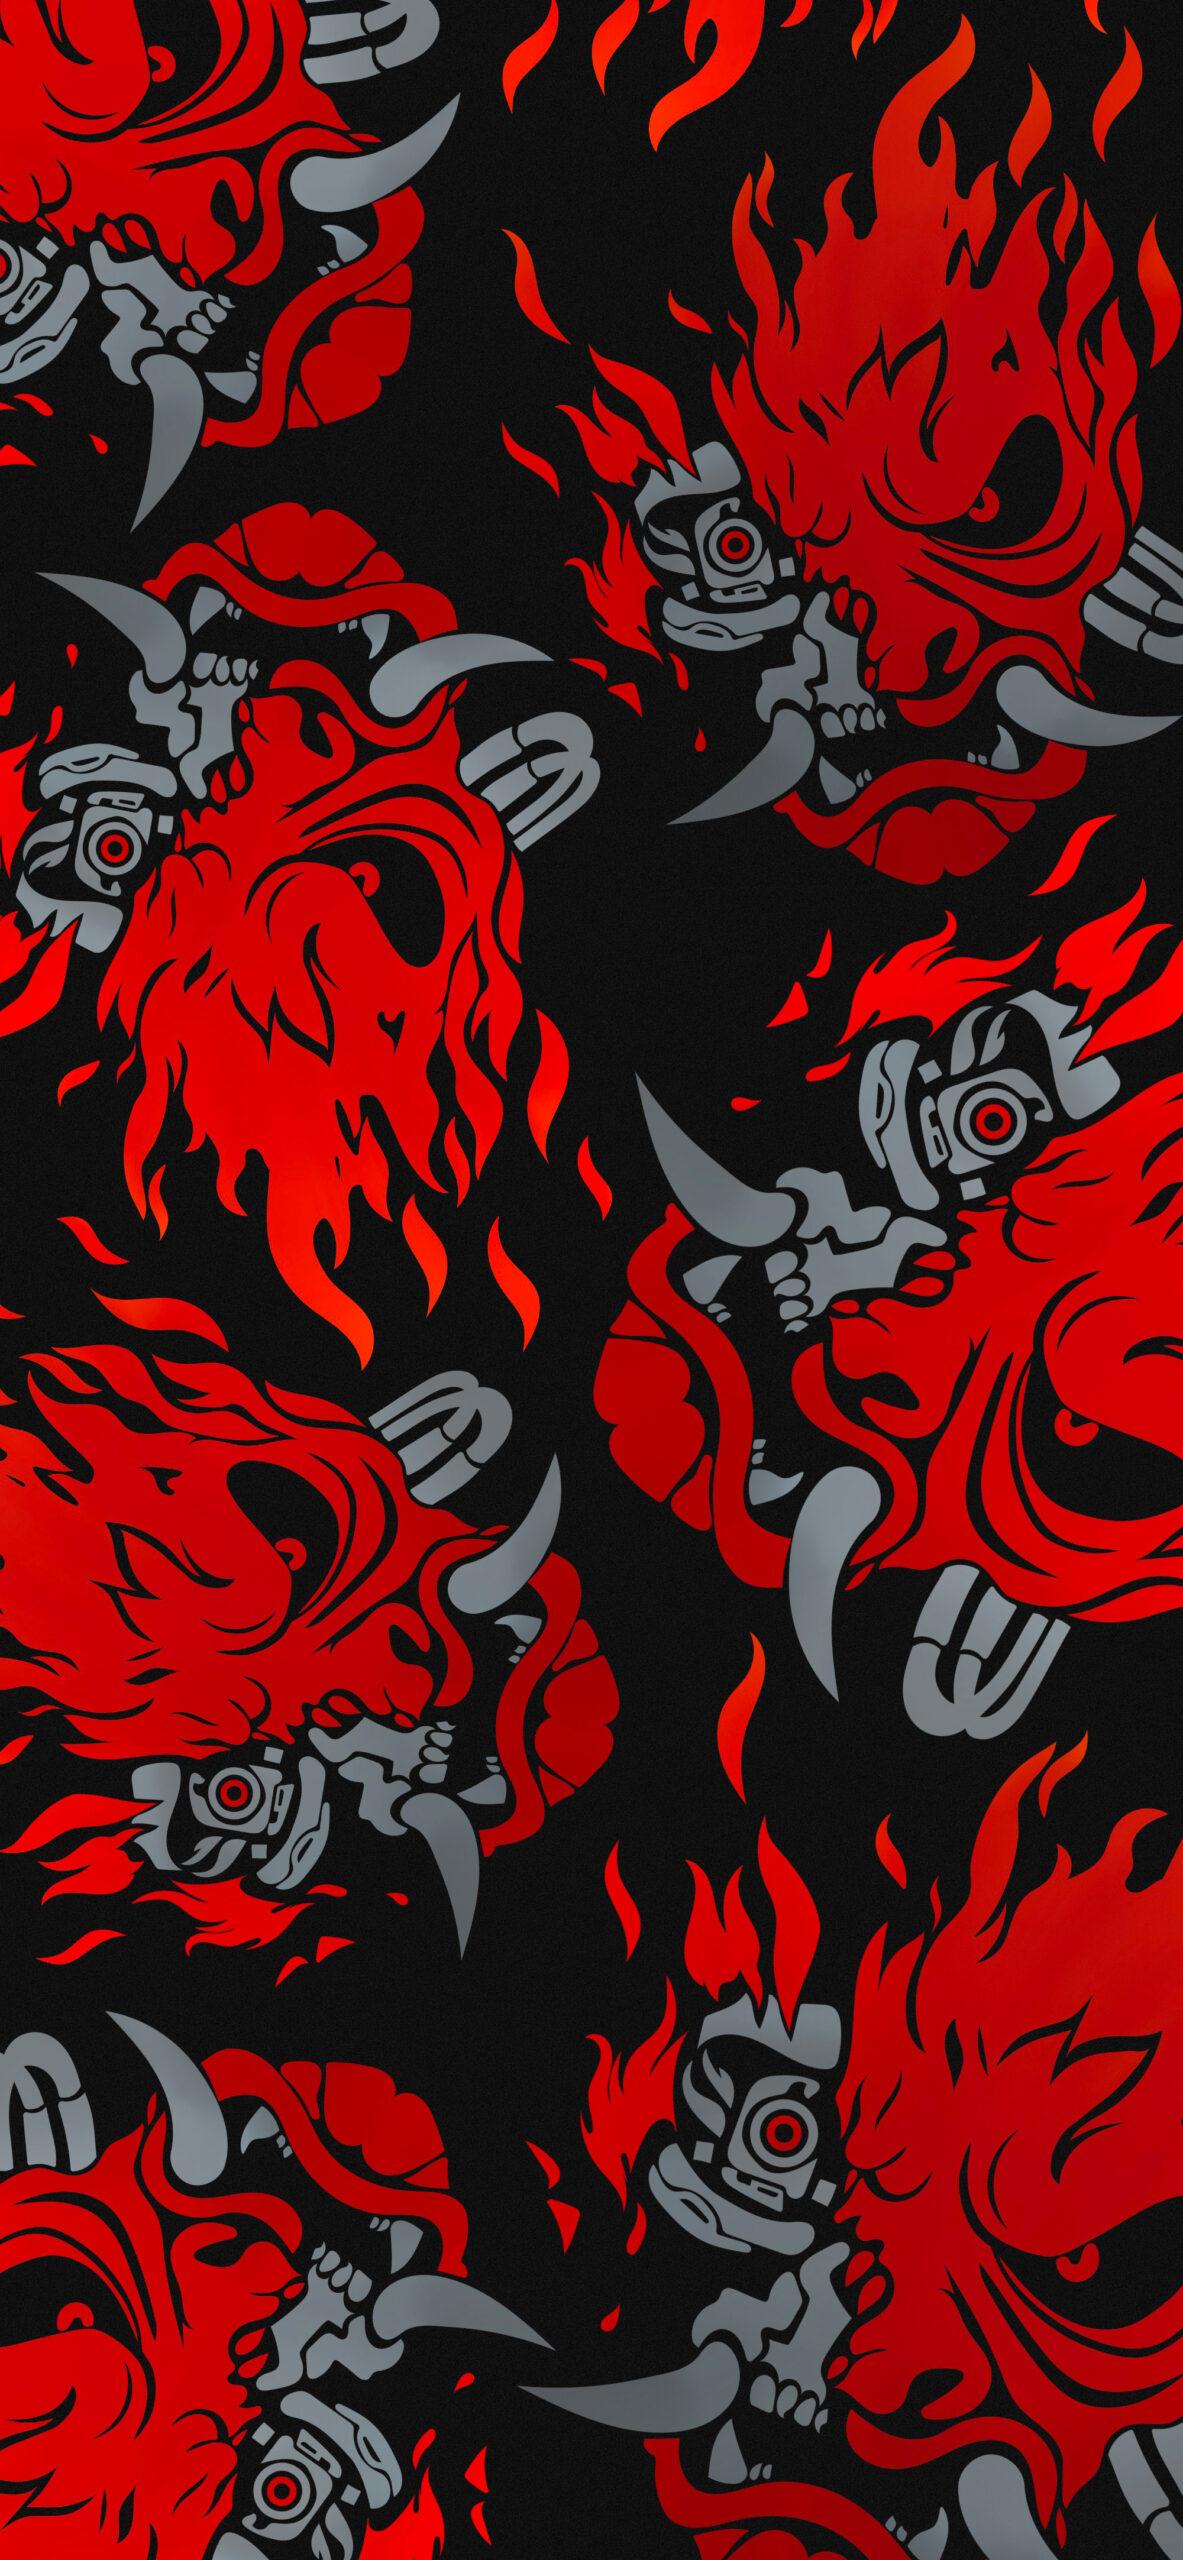 cyberpunk 2077 samurai logo black wallpaper 2